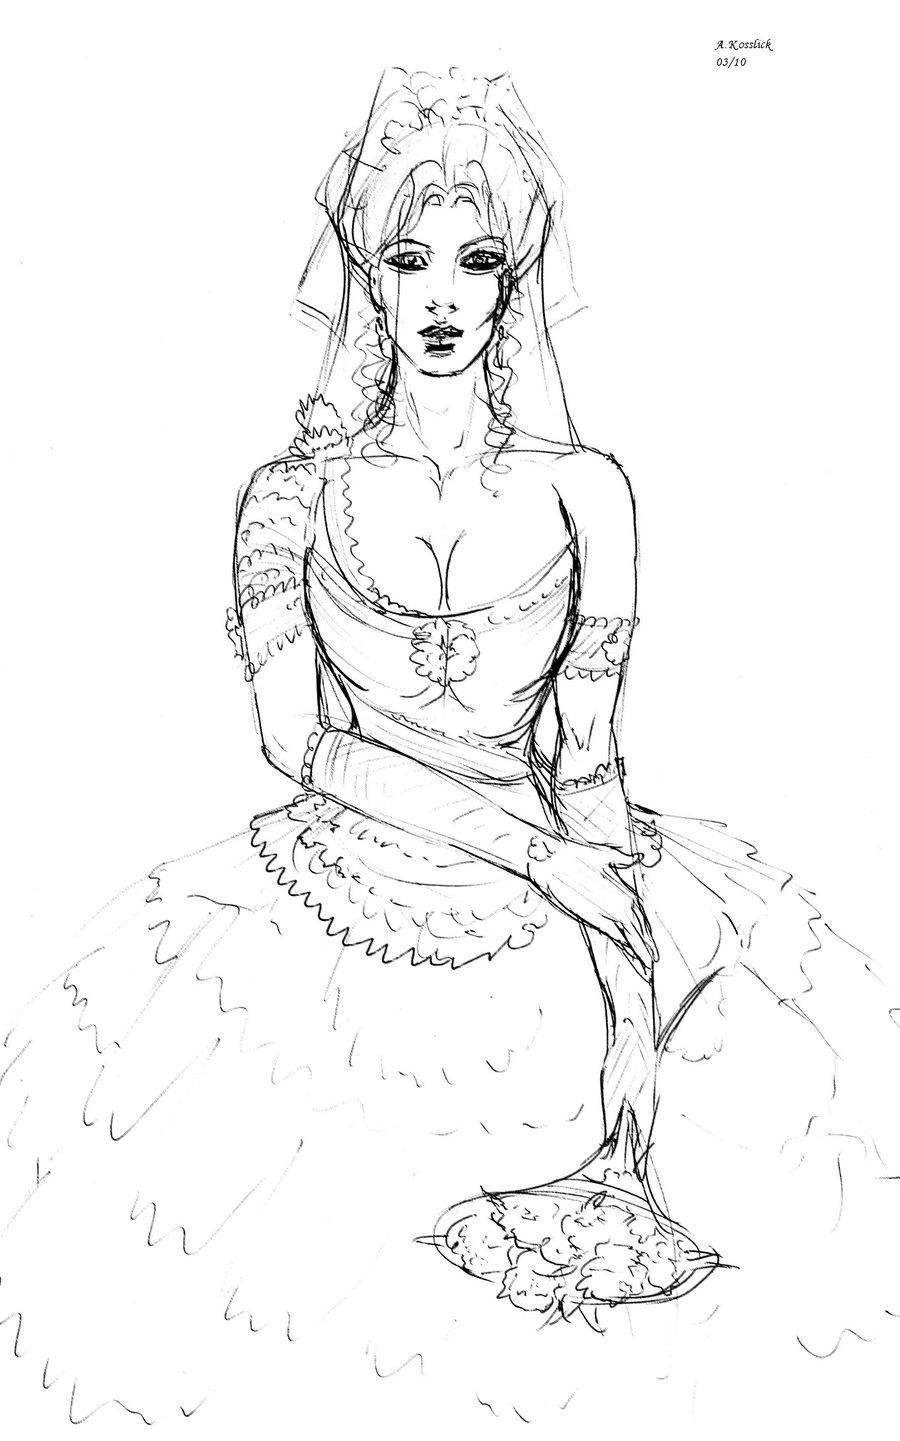 900x1441 Sketch Of A Bride By Andrekosslick